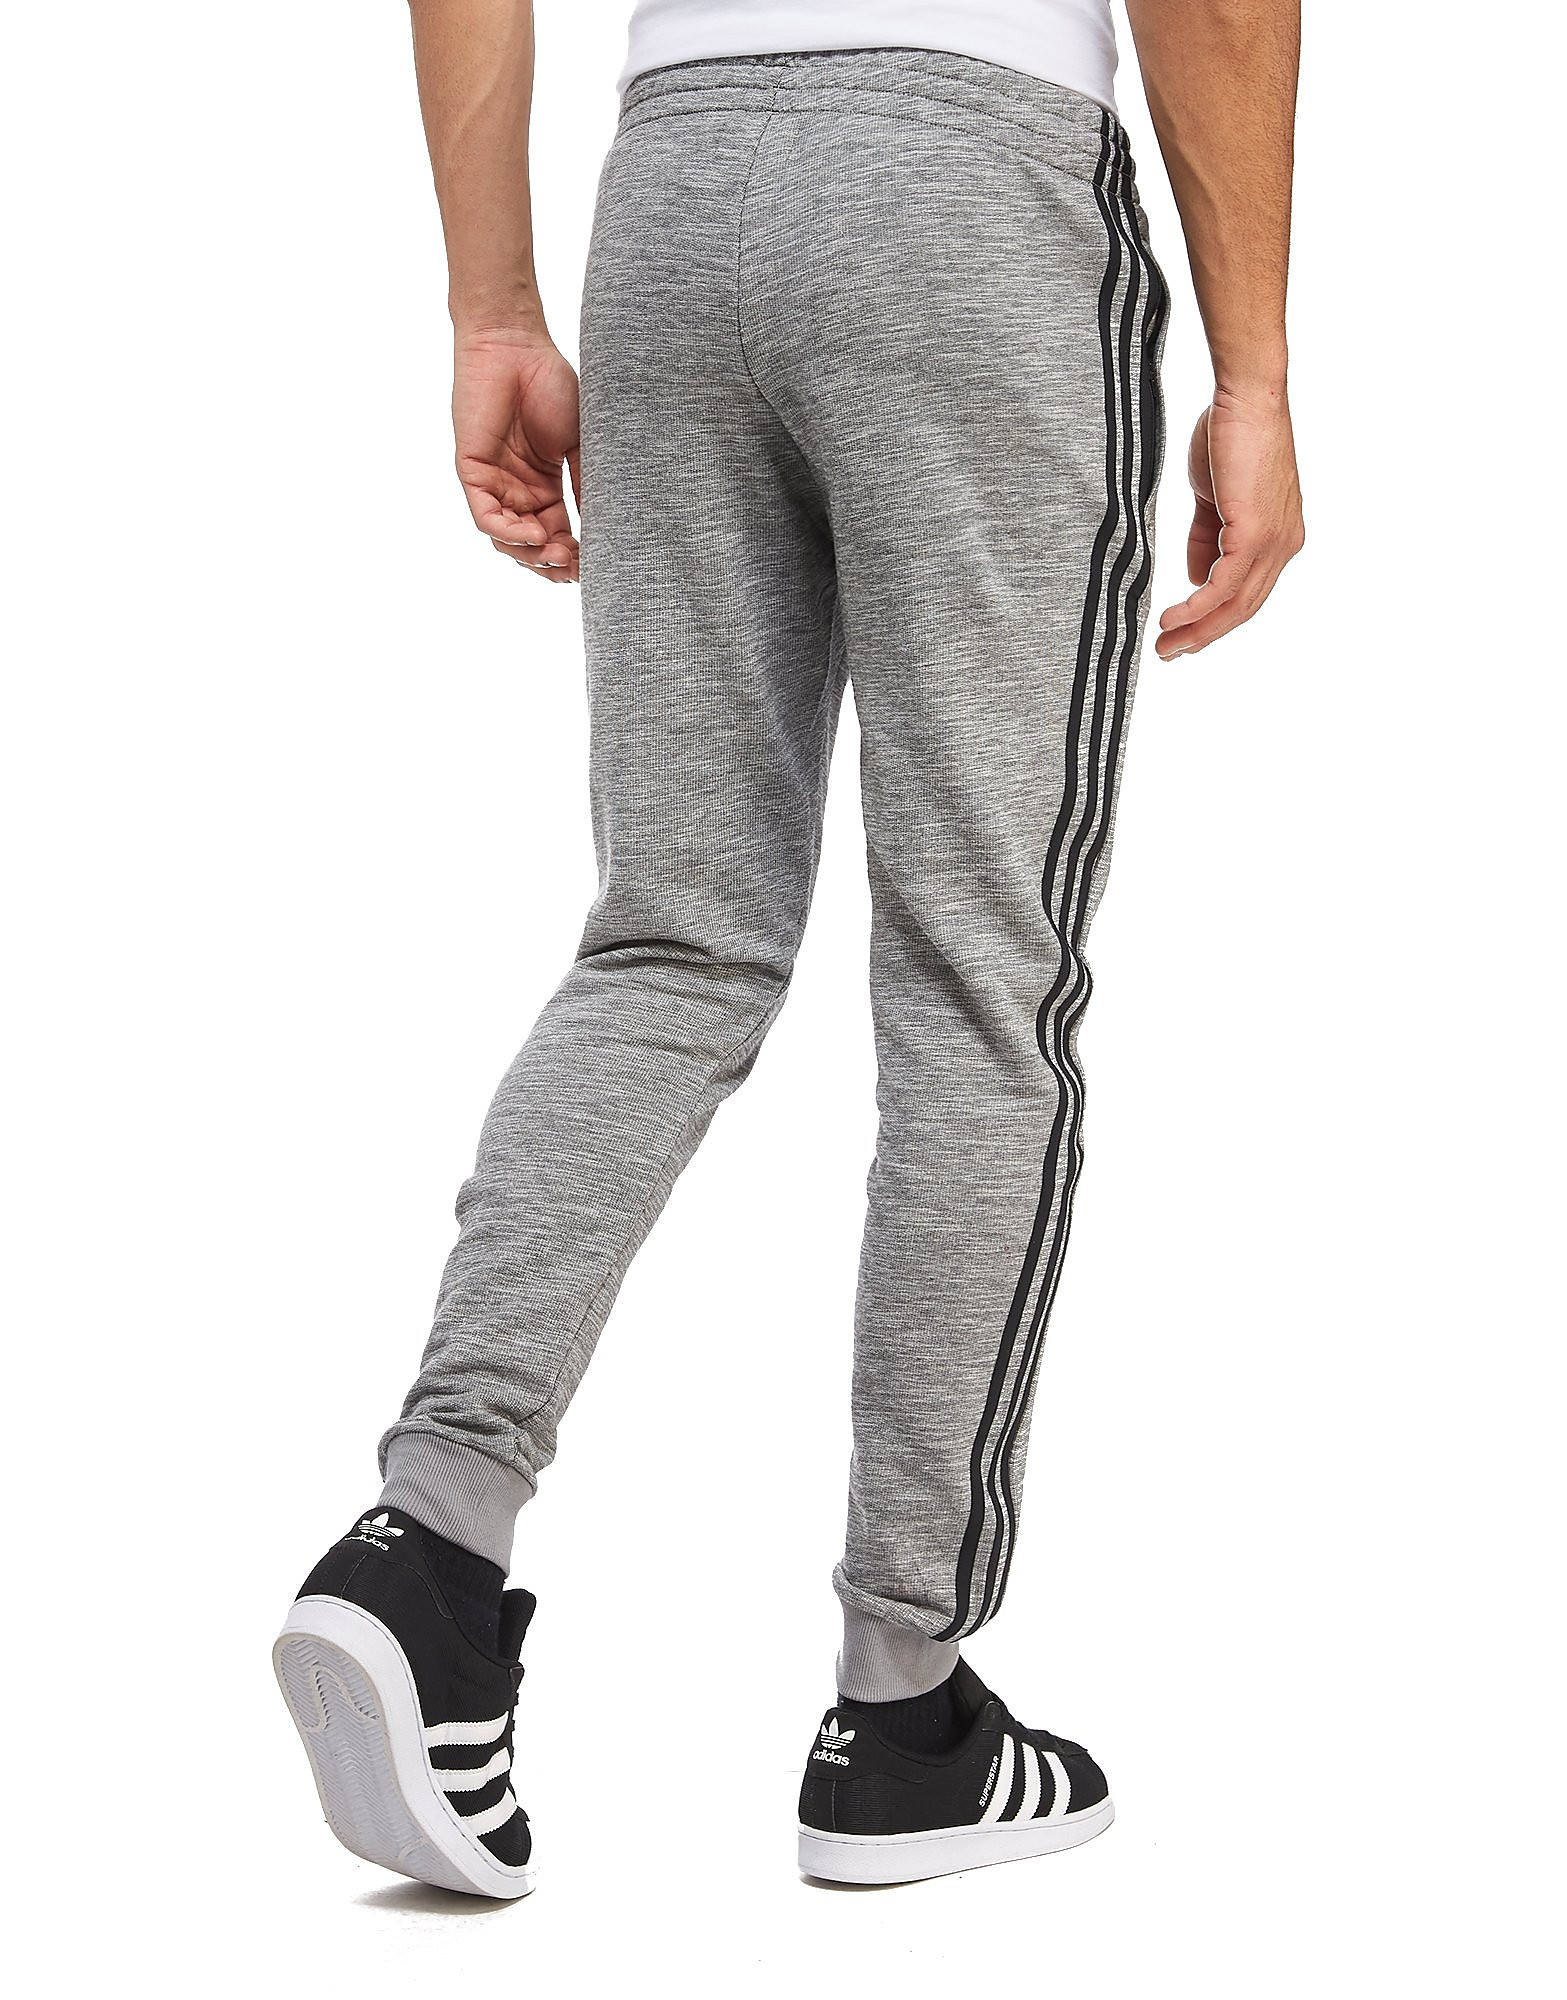 adidas Originals Superstar Knit Track Pants